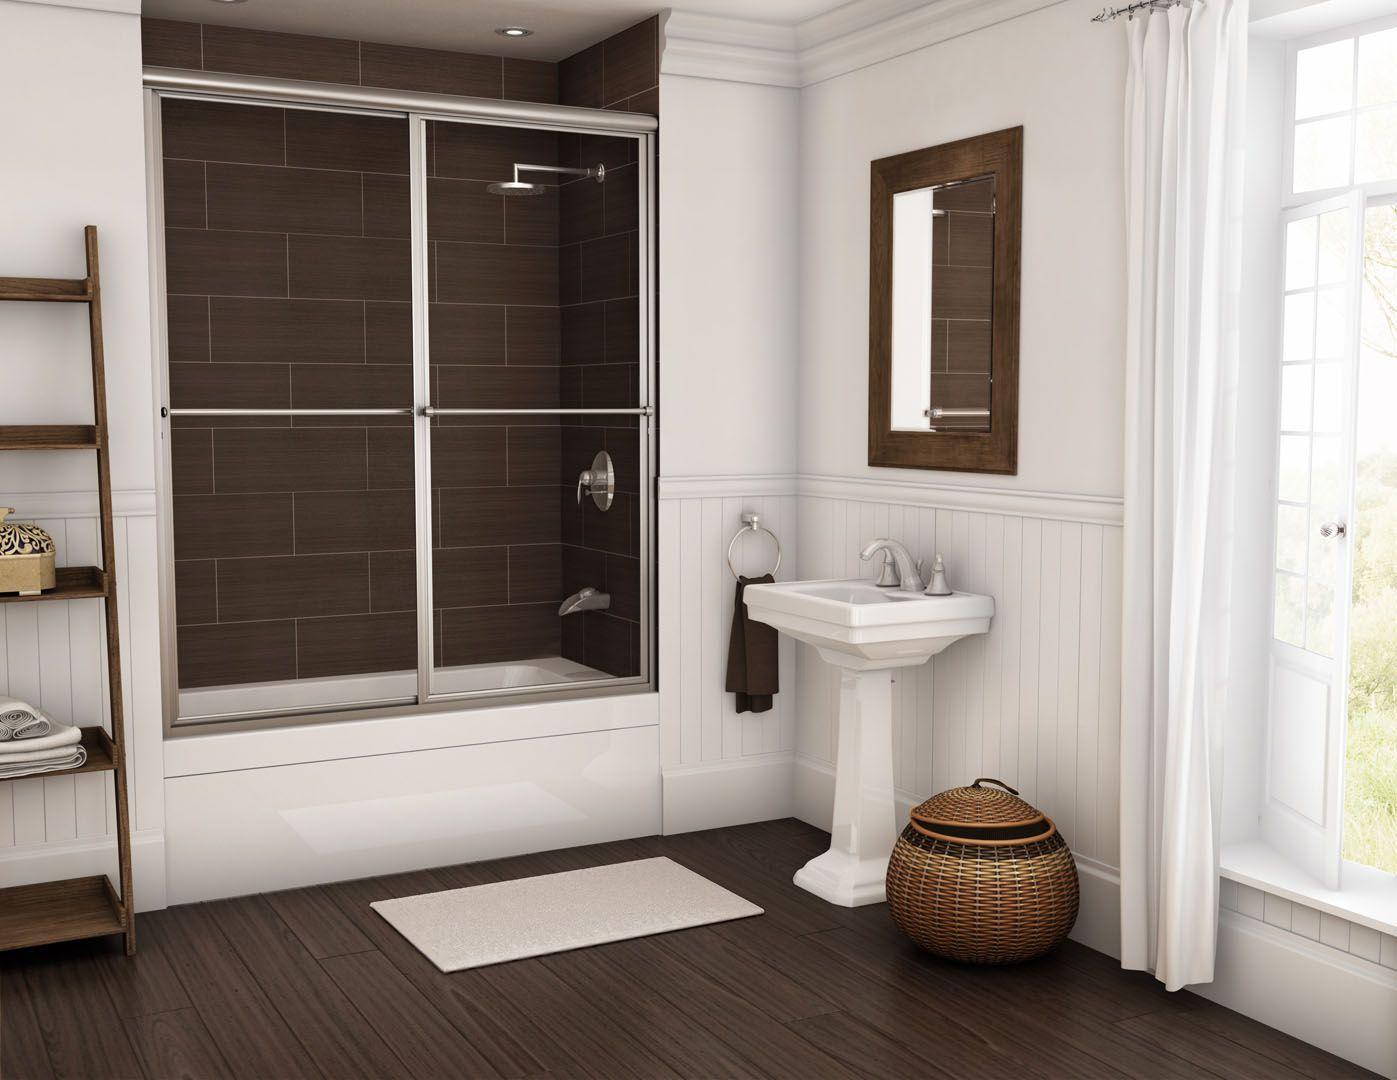 640d 650d Shower Doors Lake Bathroom Shower Tub